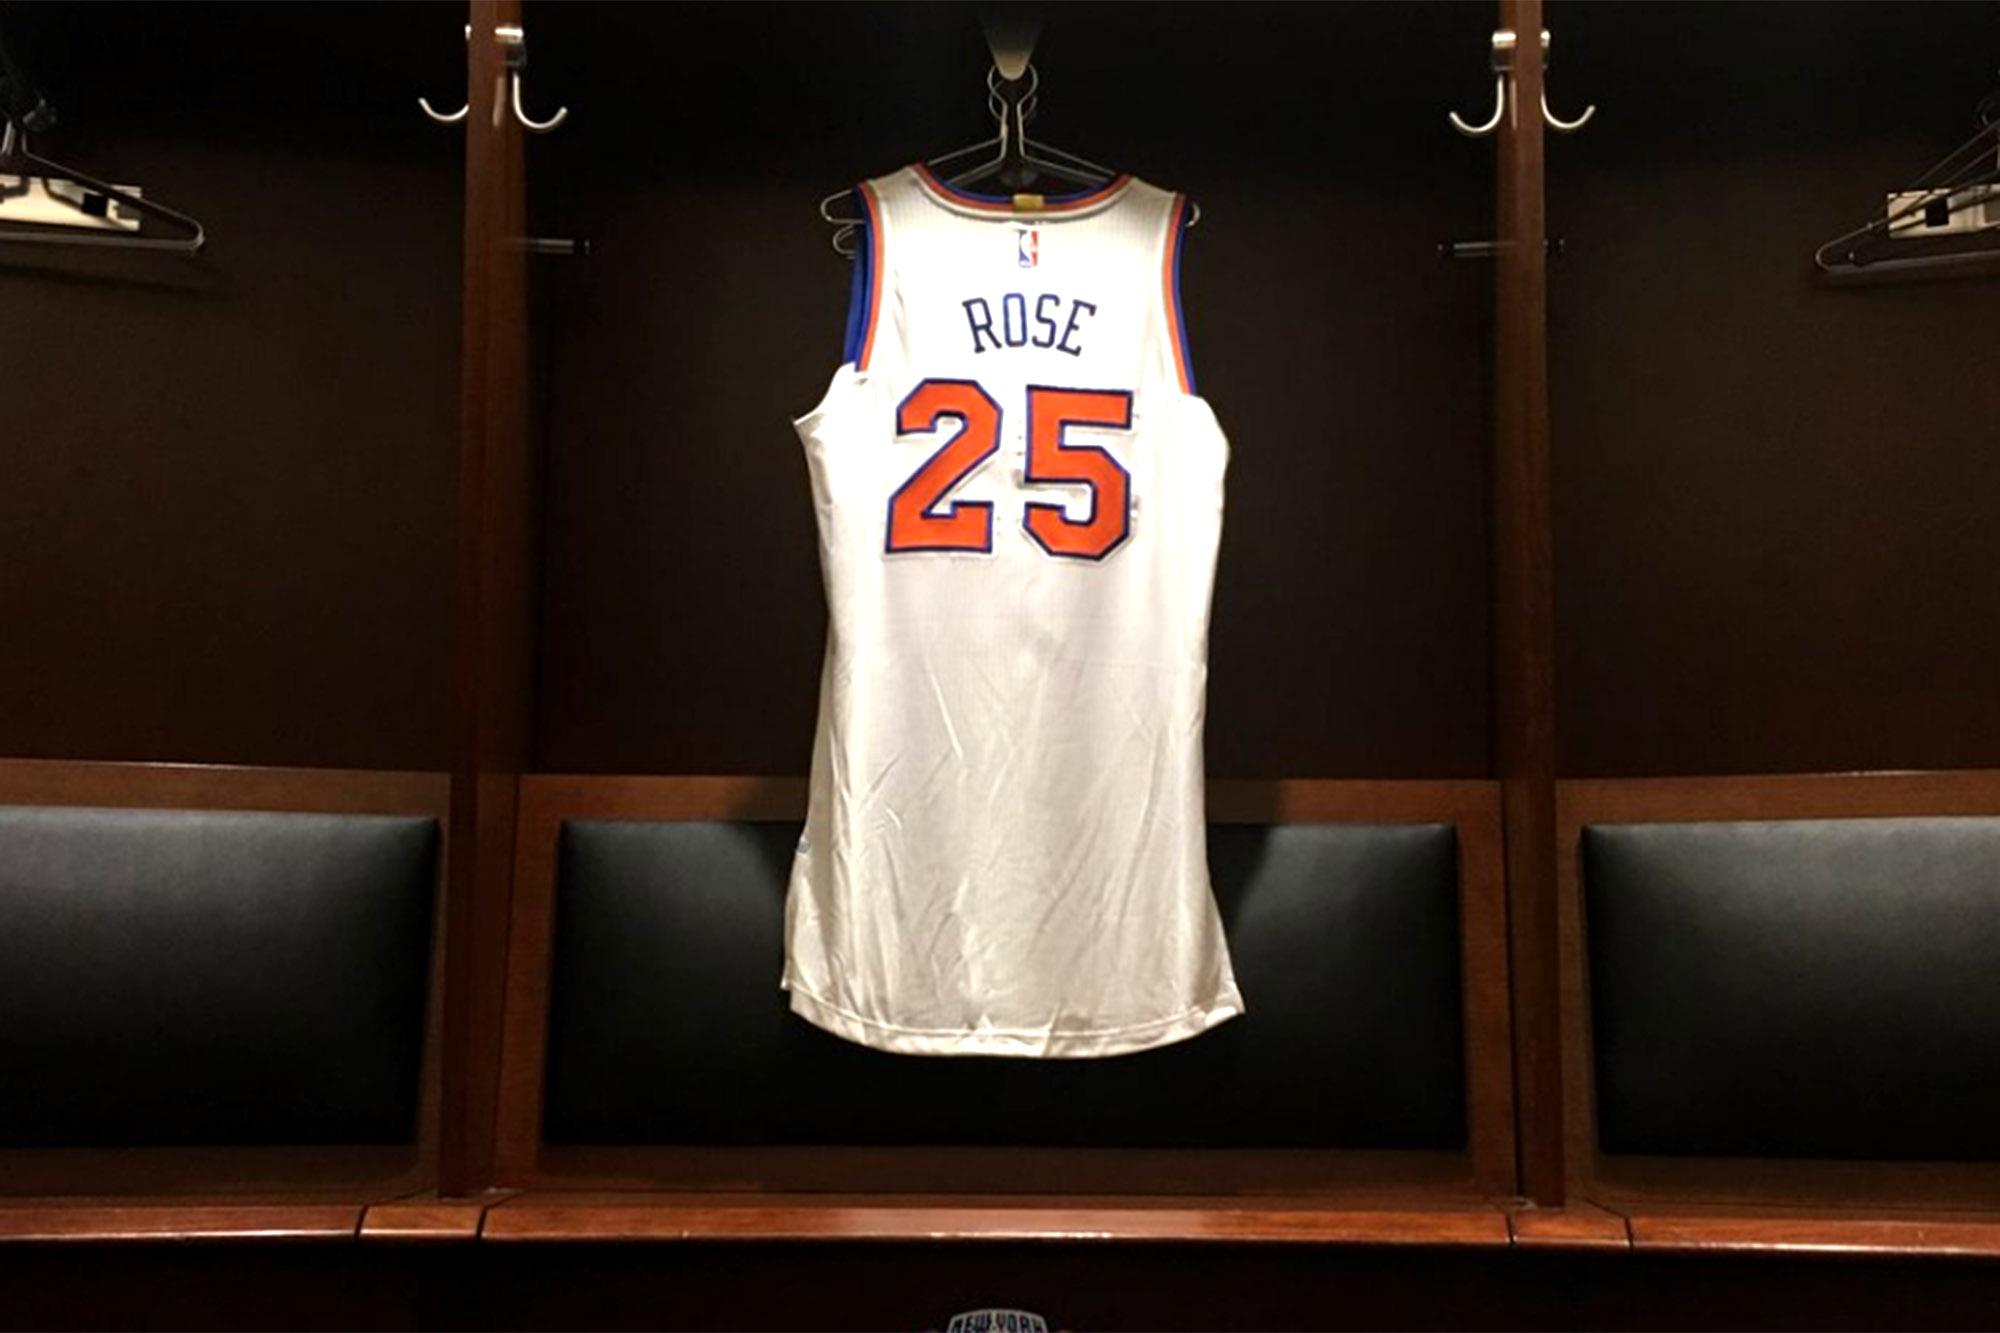 The sad story behind Derrick Rose's Knicks jersey number